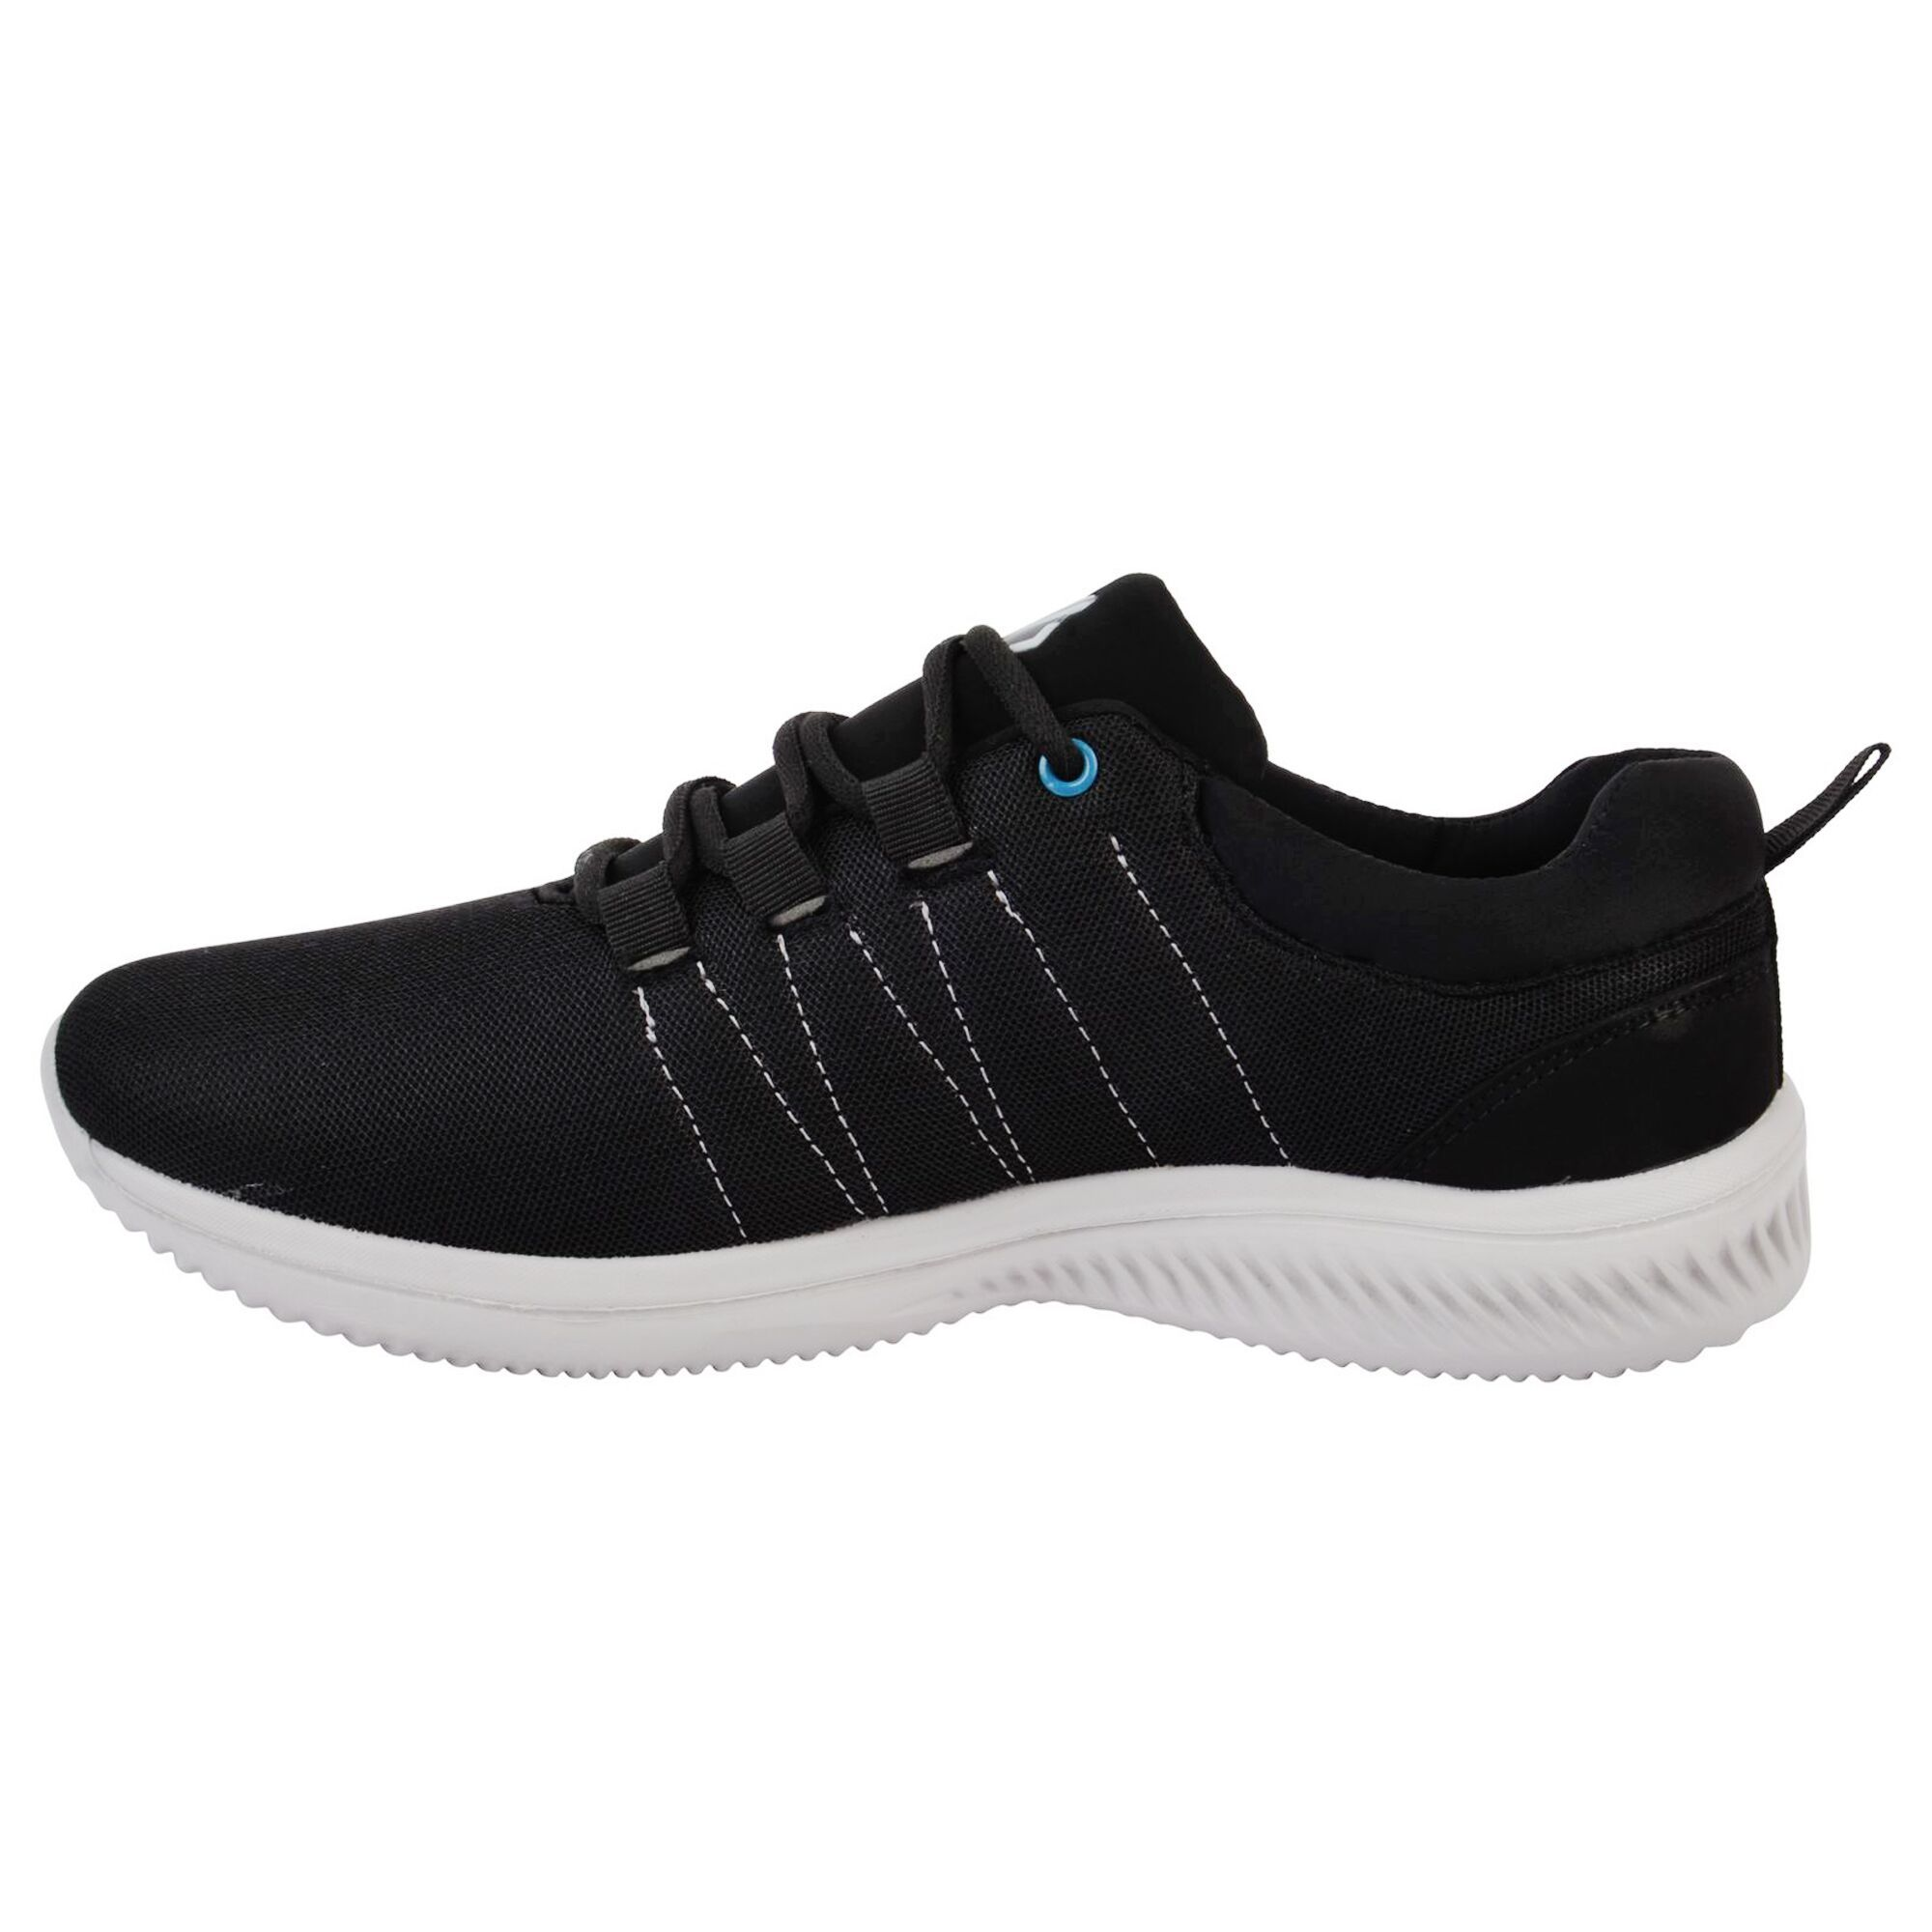 Dare 2B Mens Sprint Trainers (Black)